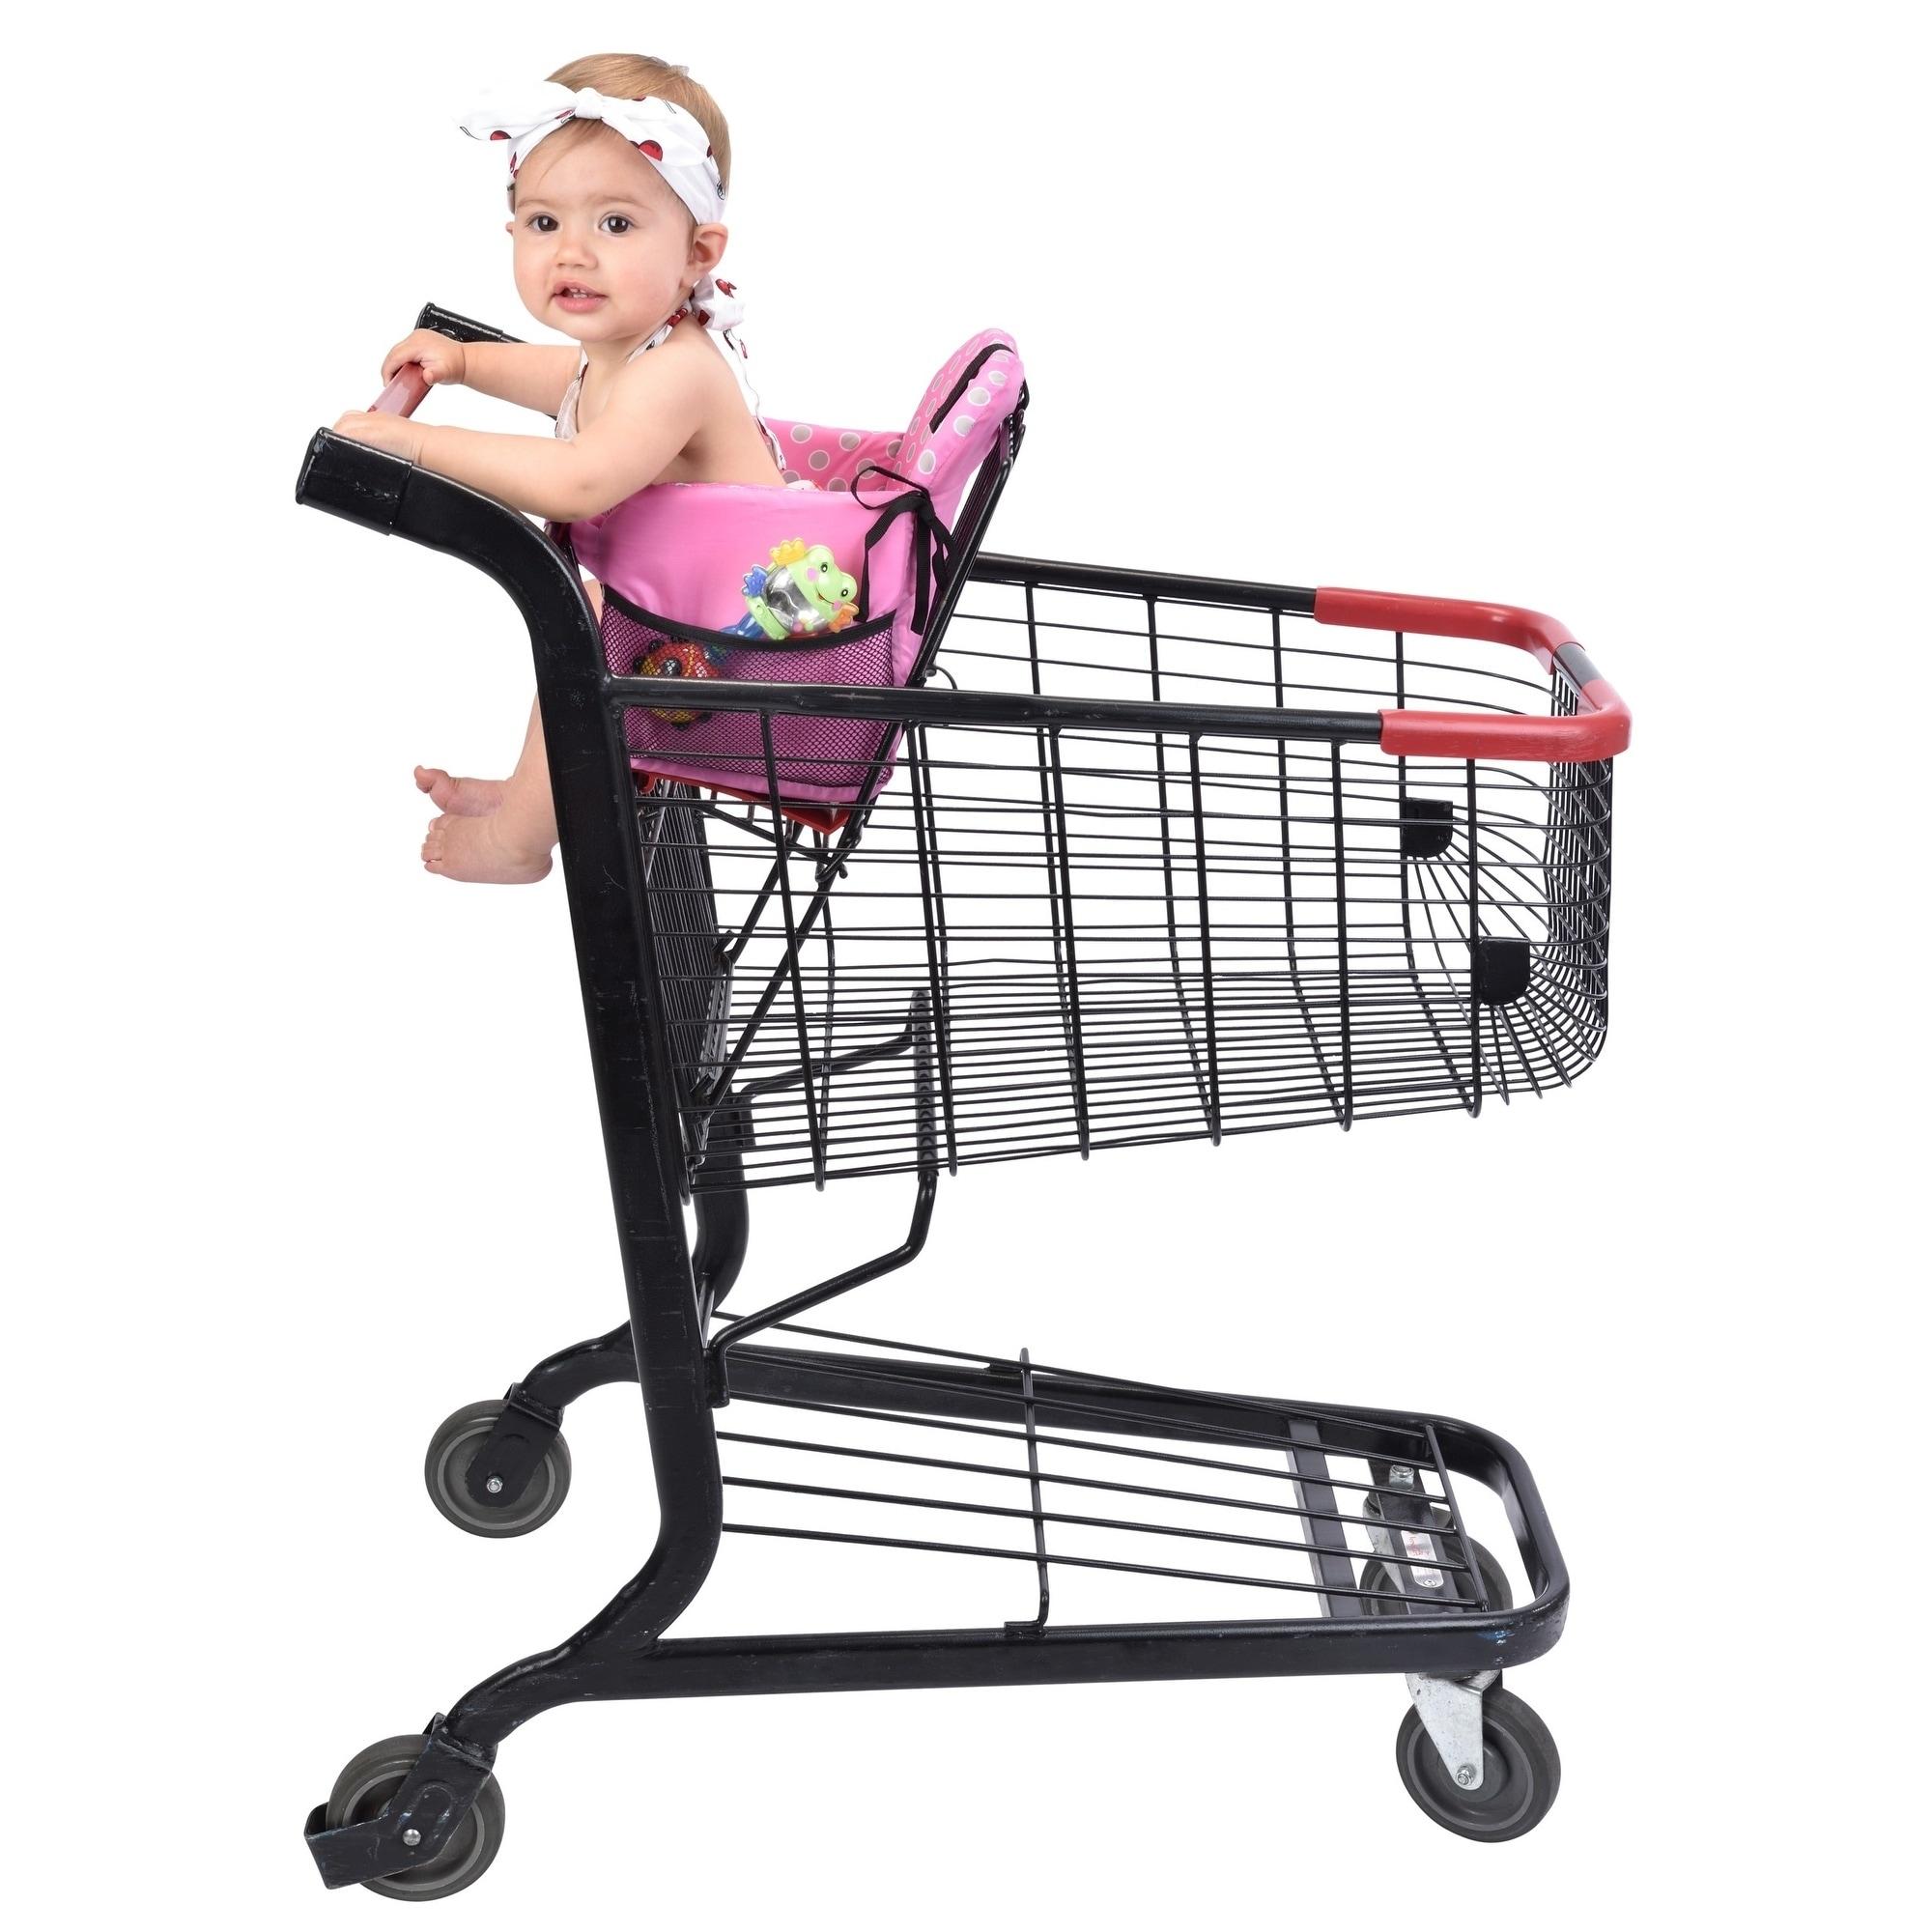 Incredible 4 24 Months Universal Fit Ziggy Momogo Baby Shopping Cart Spiritservingveterans Wood Chair Design Ideas Spiritservingveteransorg